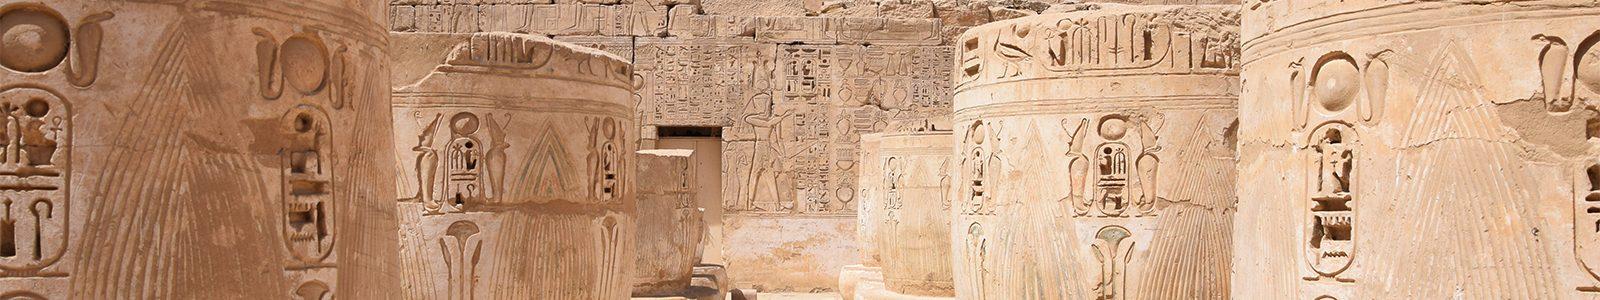 Egypt Itinerary 10 Days